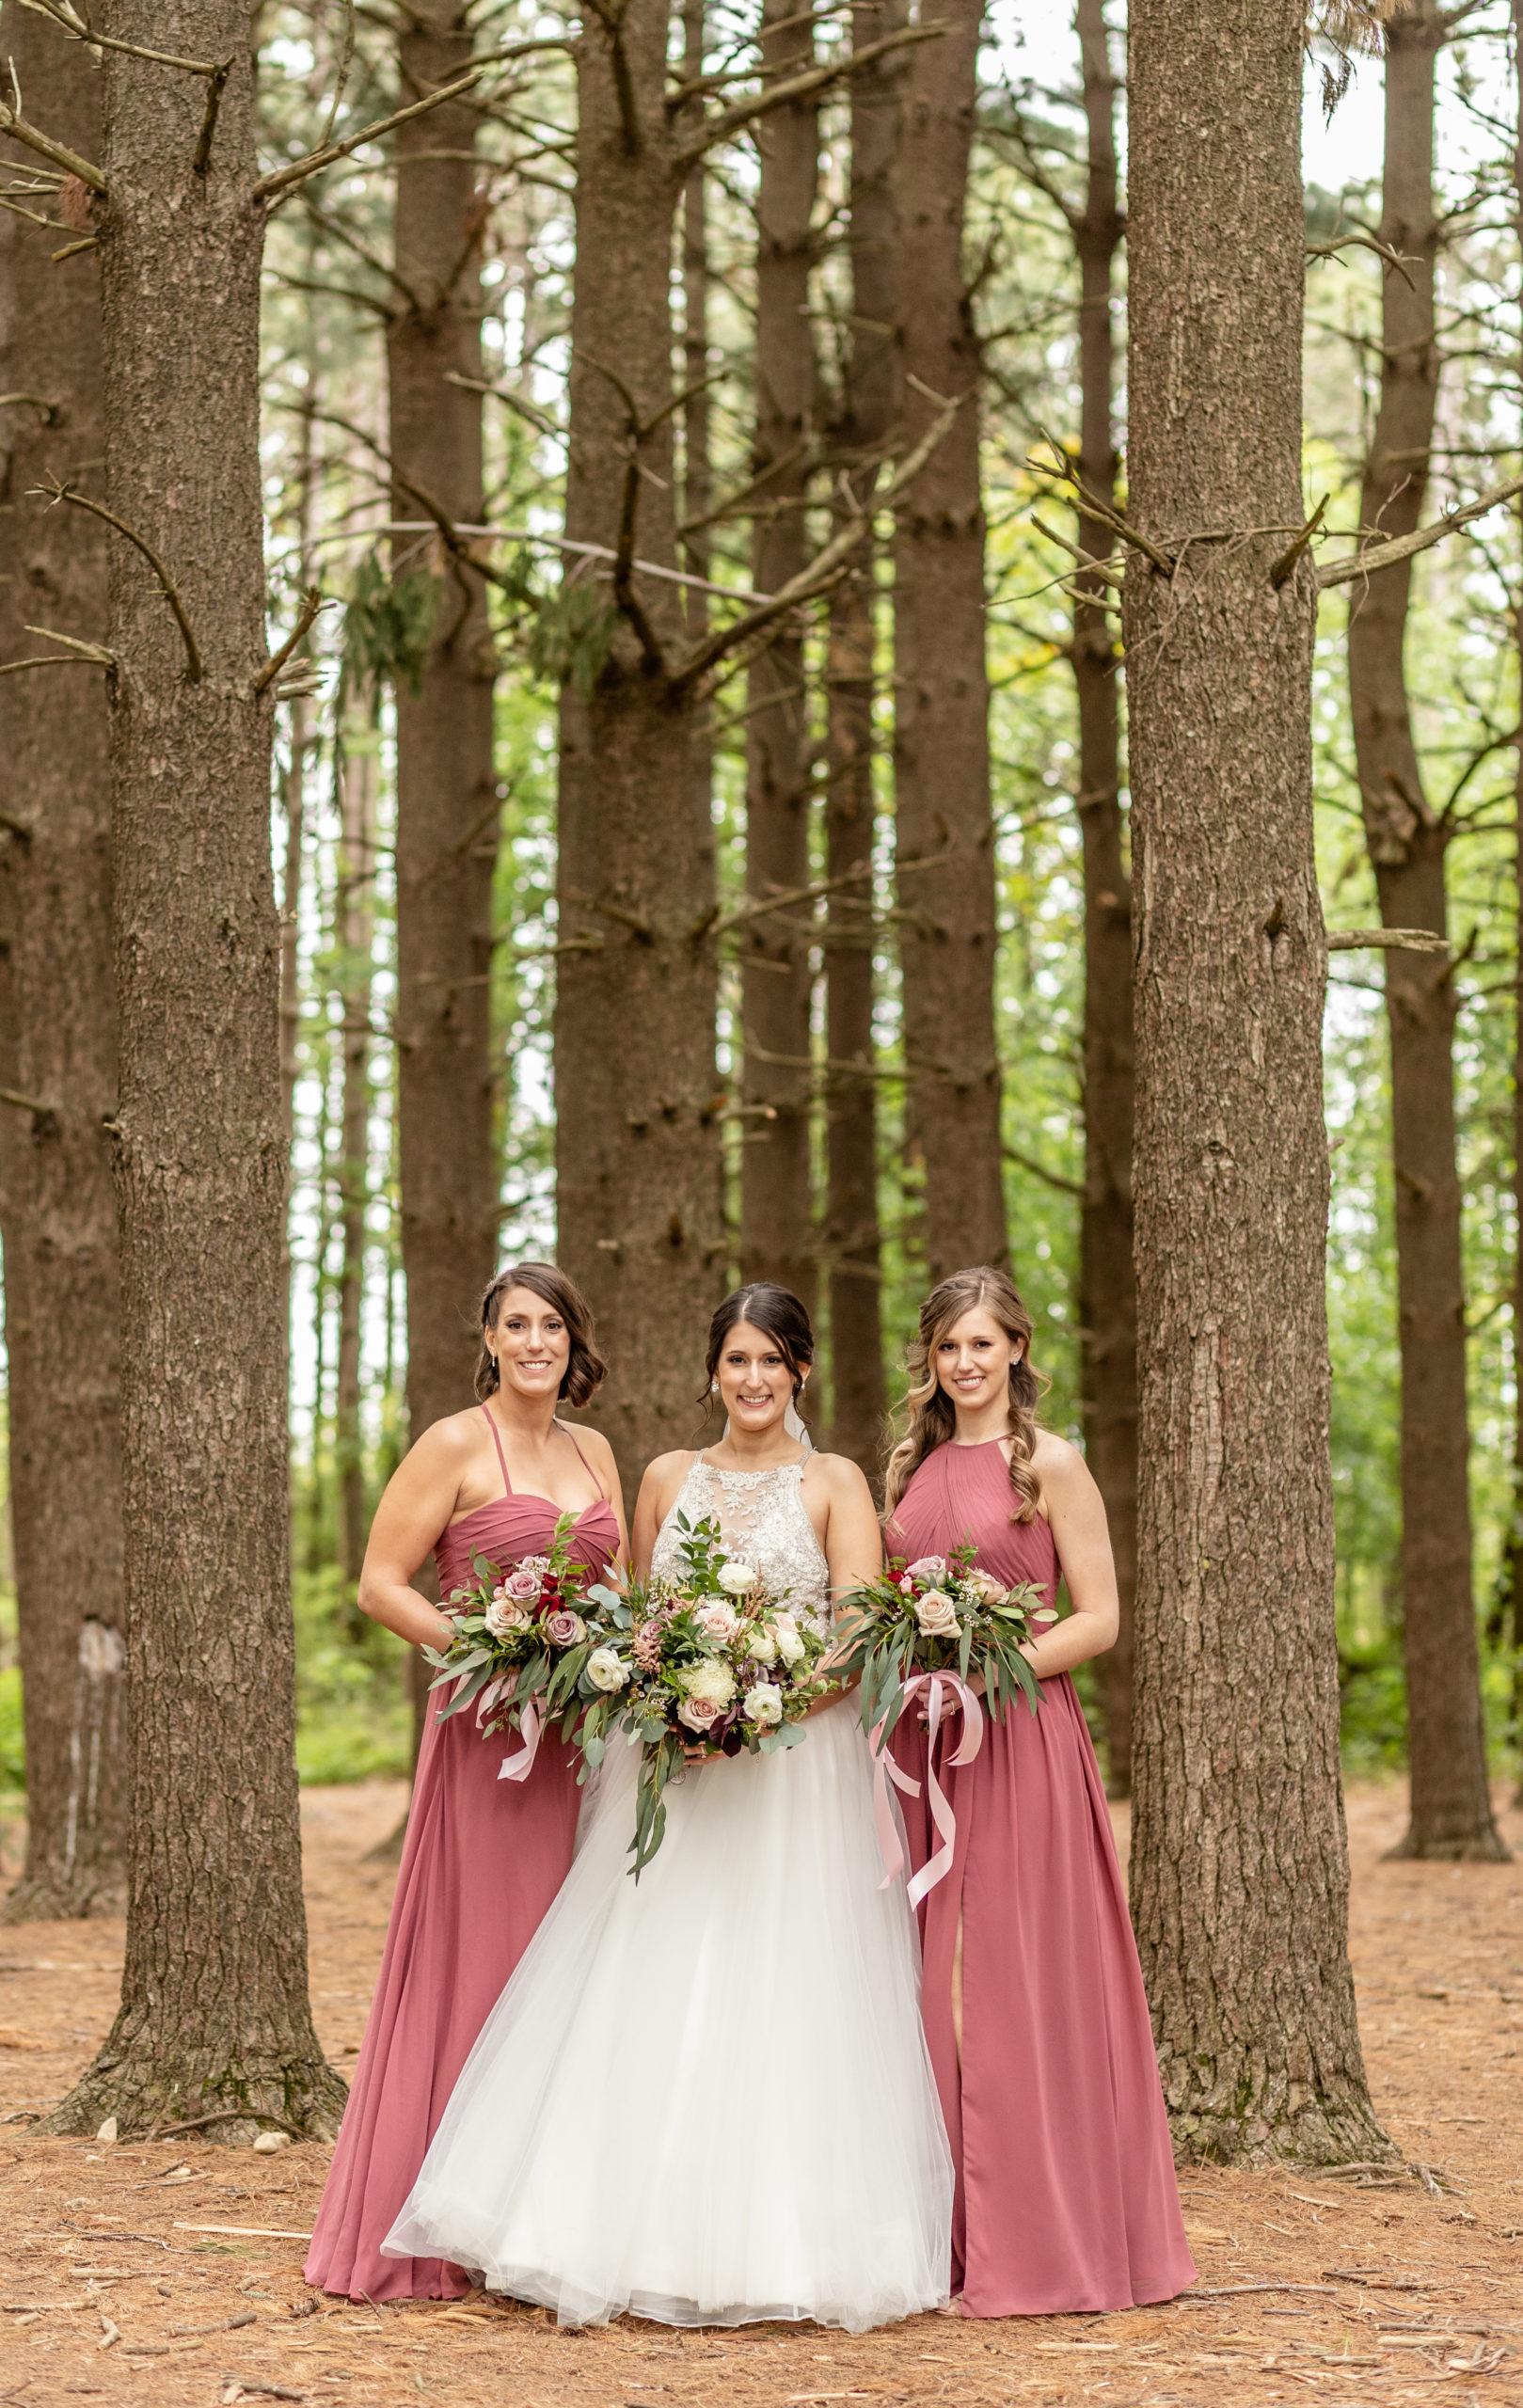 wedding dress, bride's maids, pine trees, rusty pink,southern illinois photographer